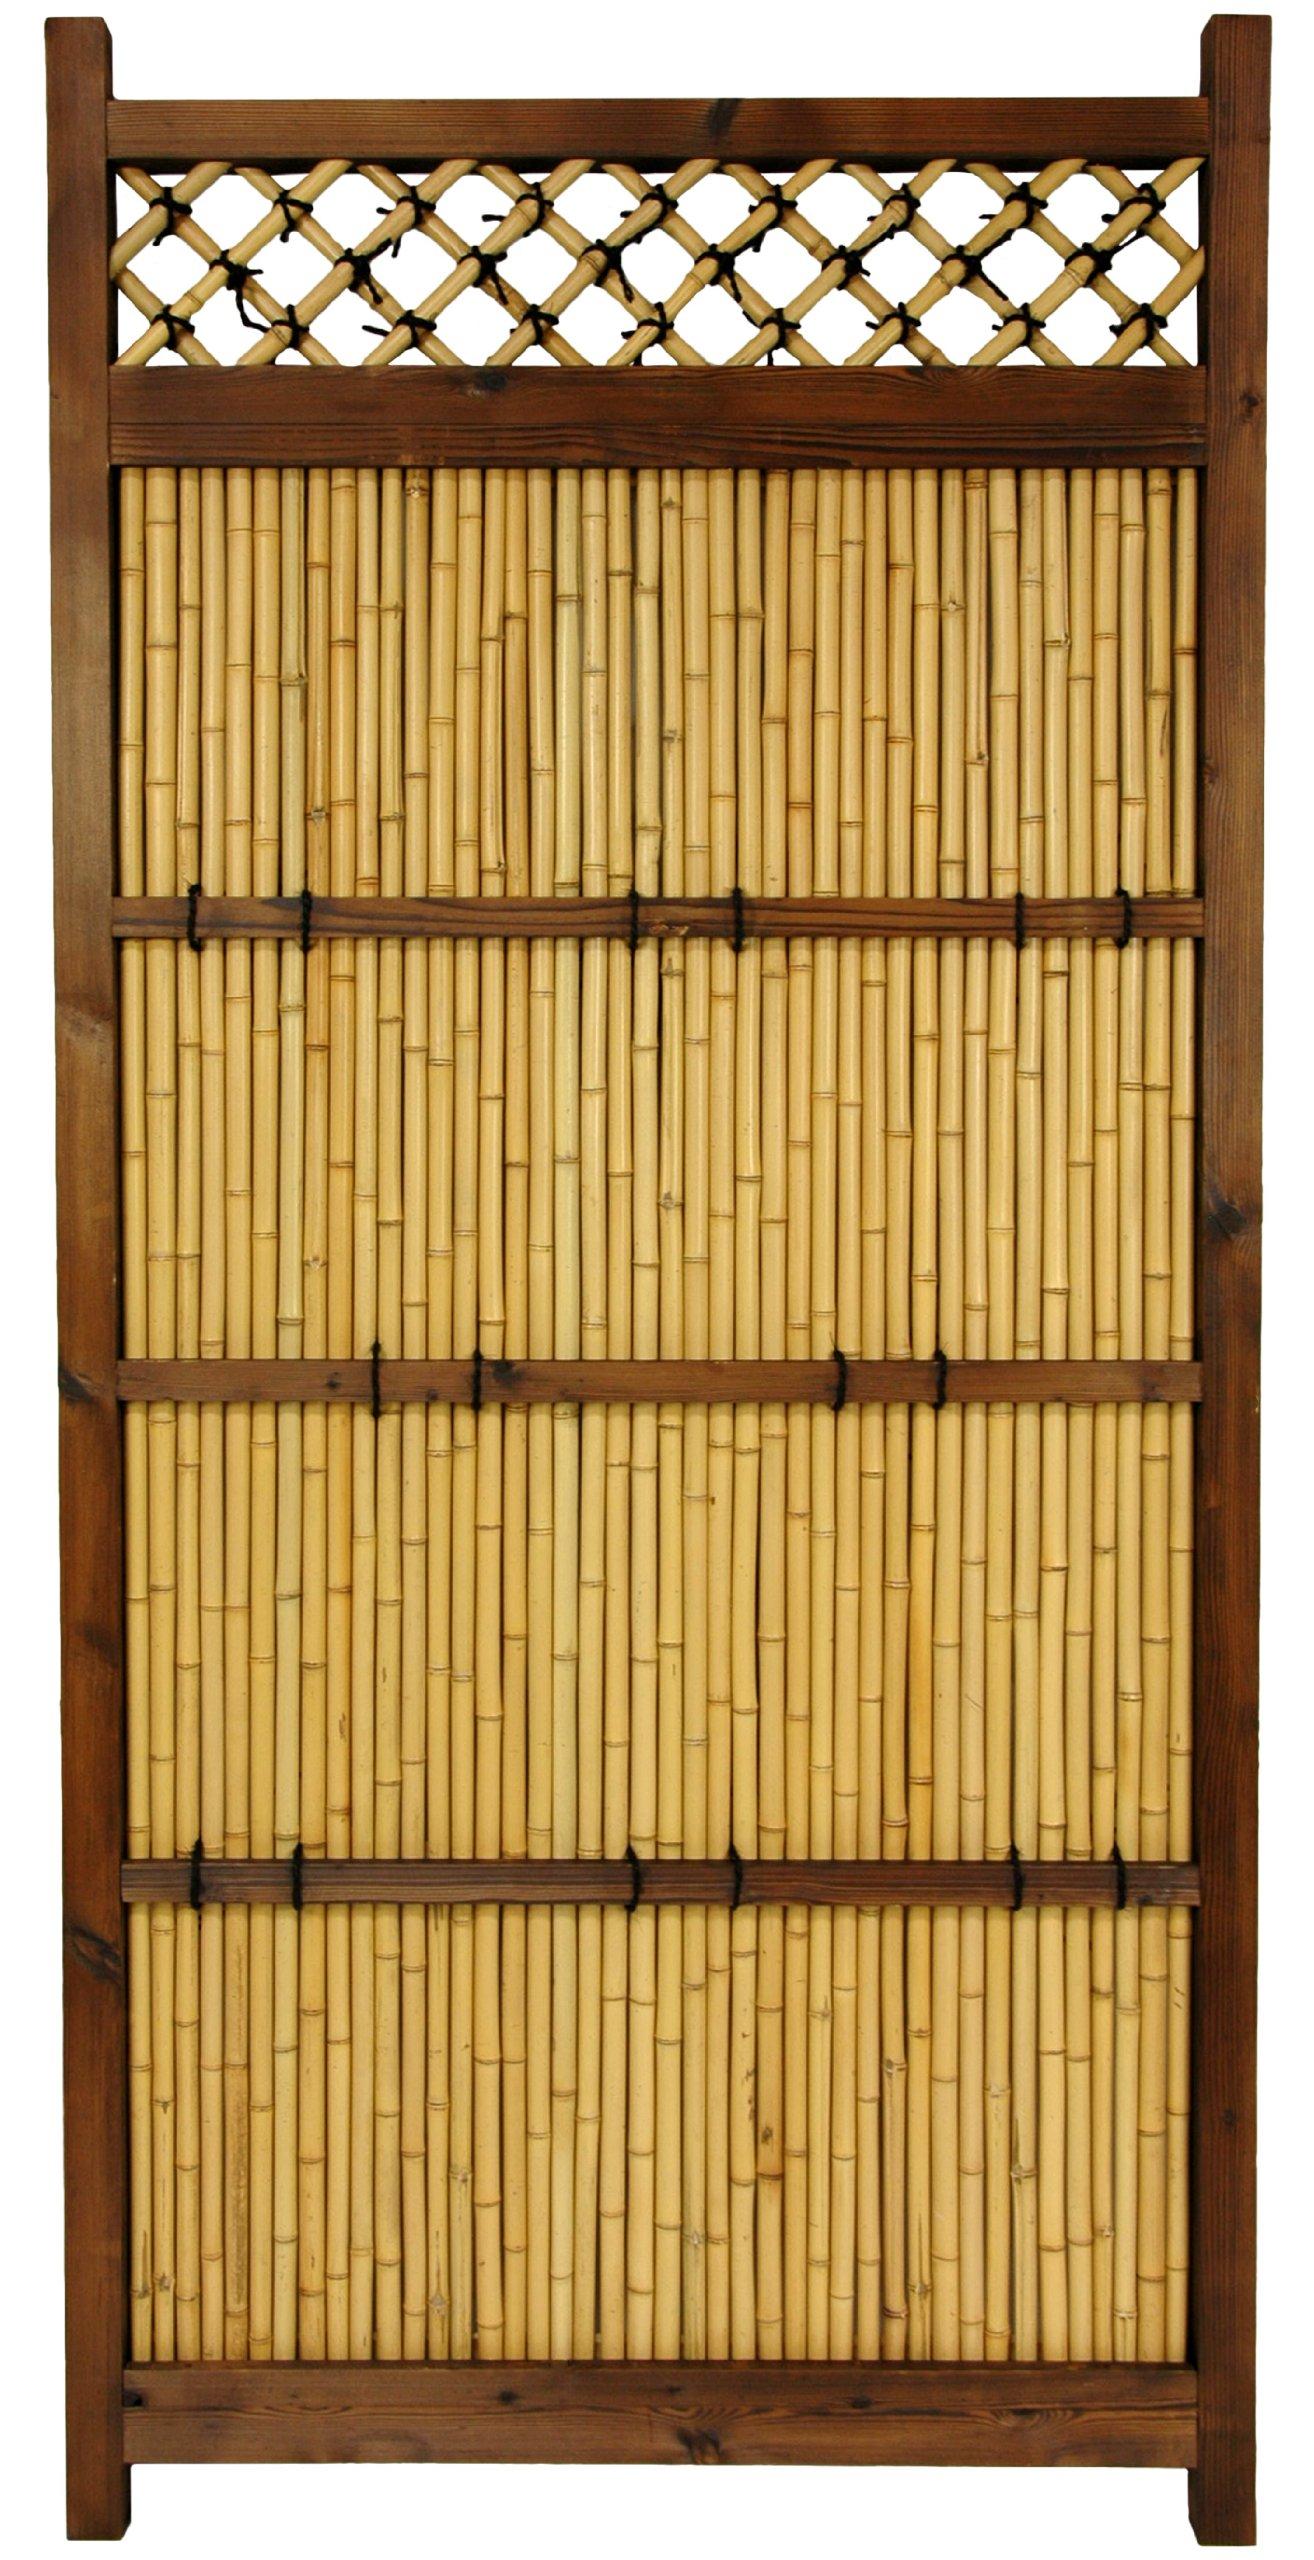 Oriental Furniture 6 ft. x 3 ft. Japanese Bamboo Zen Garden Fence by ORIENTAL FURNITURE